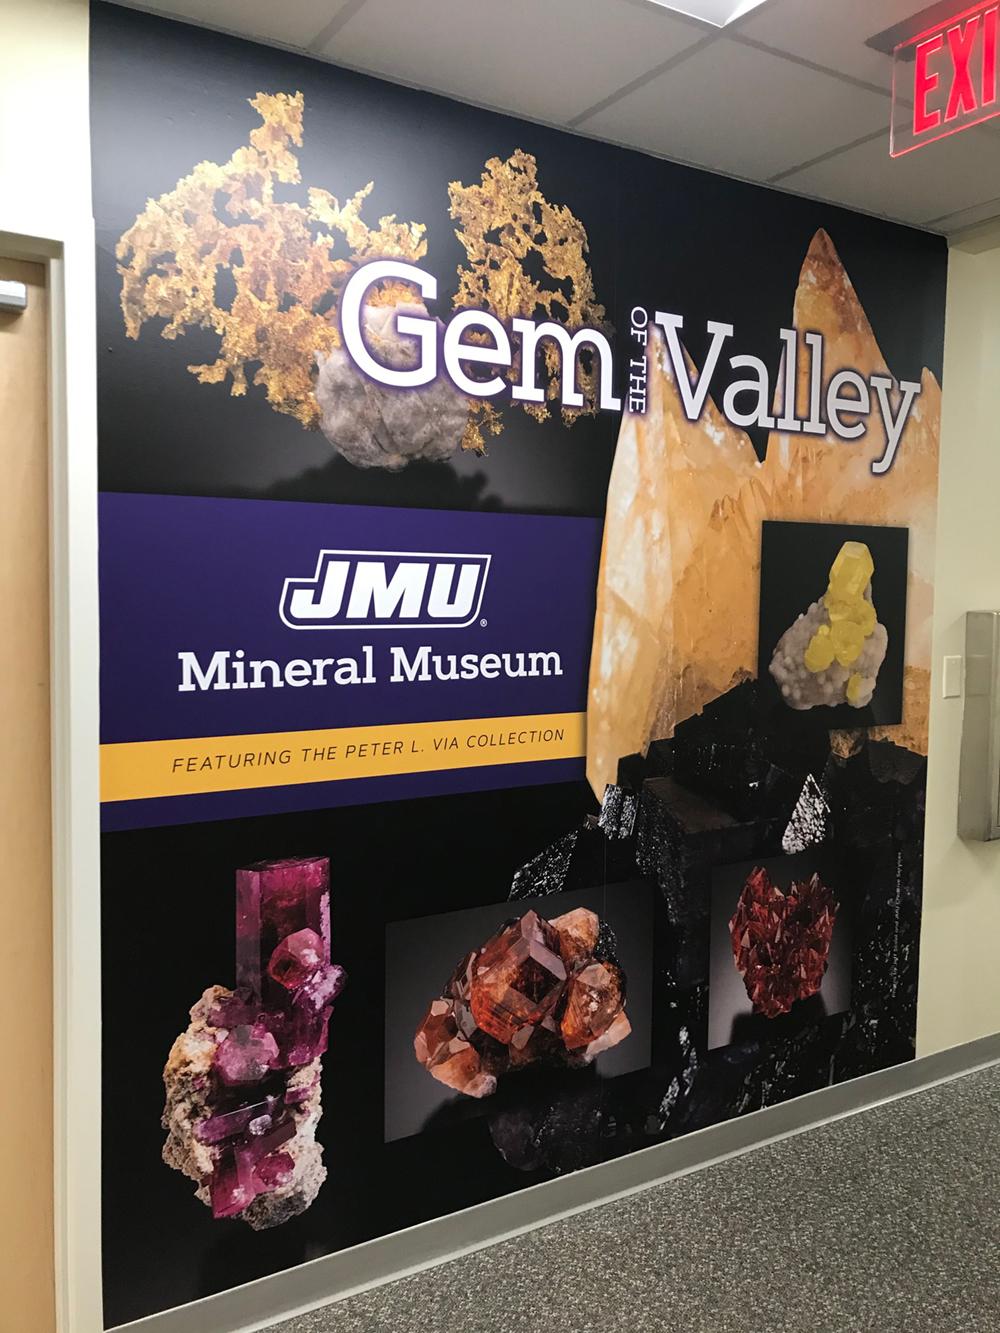 JMU Mineral Museum signage